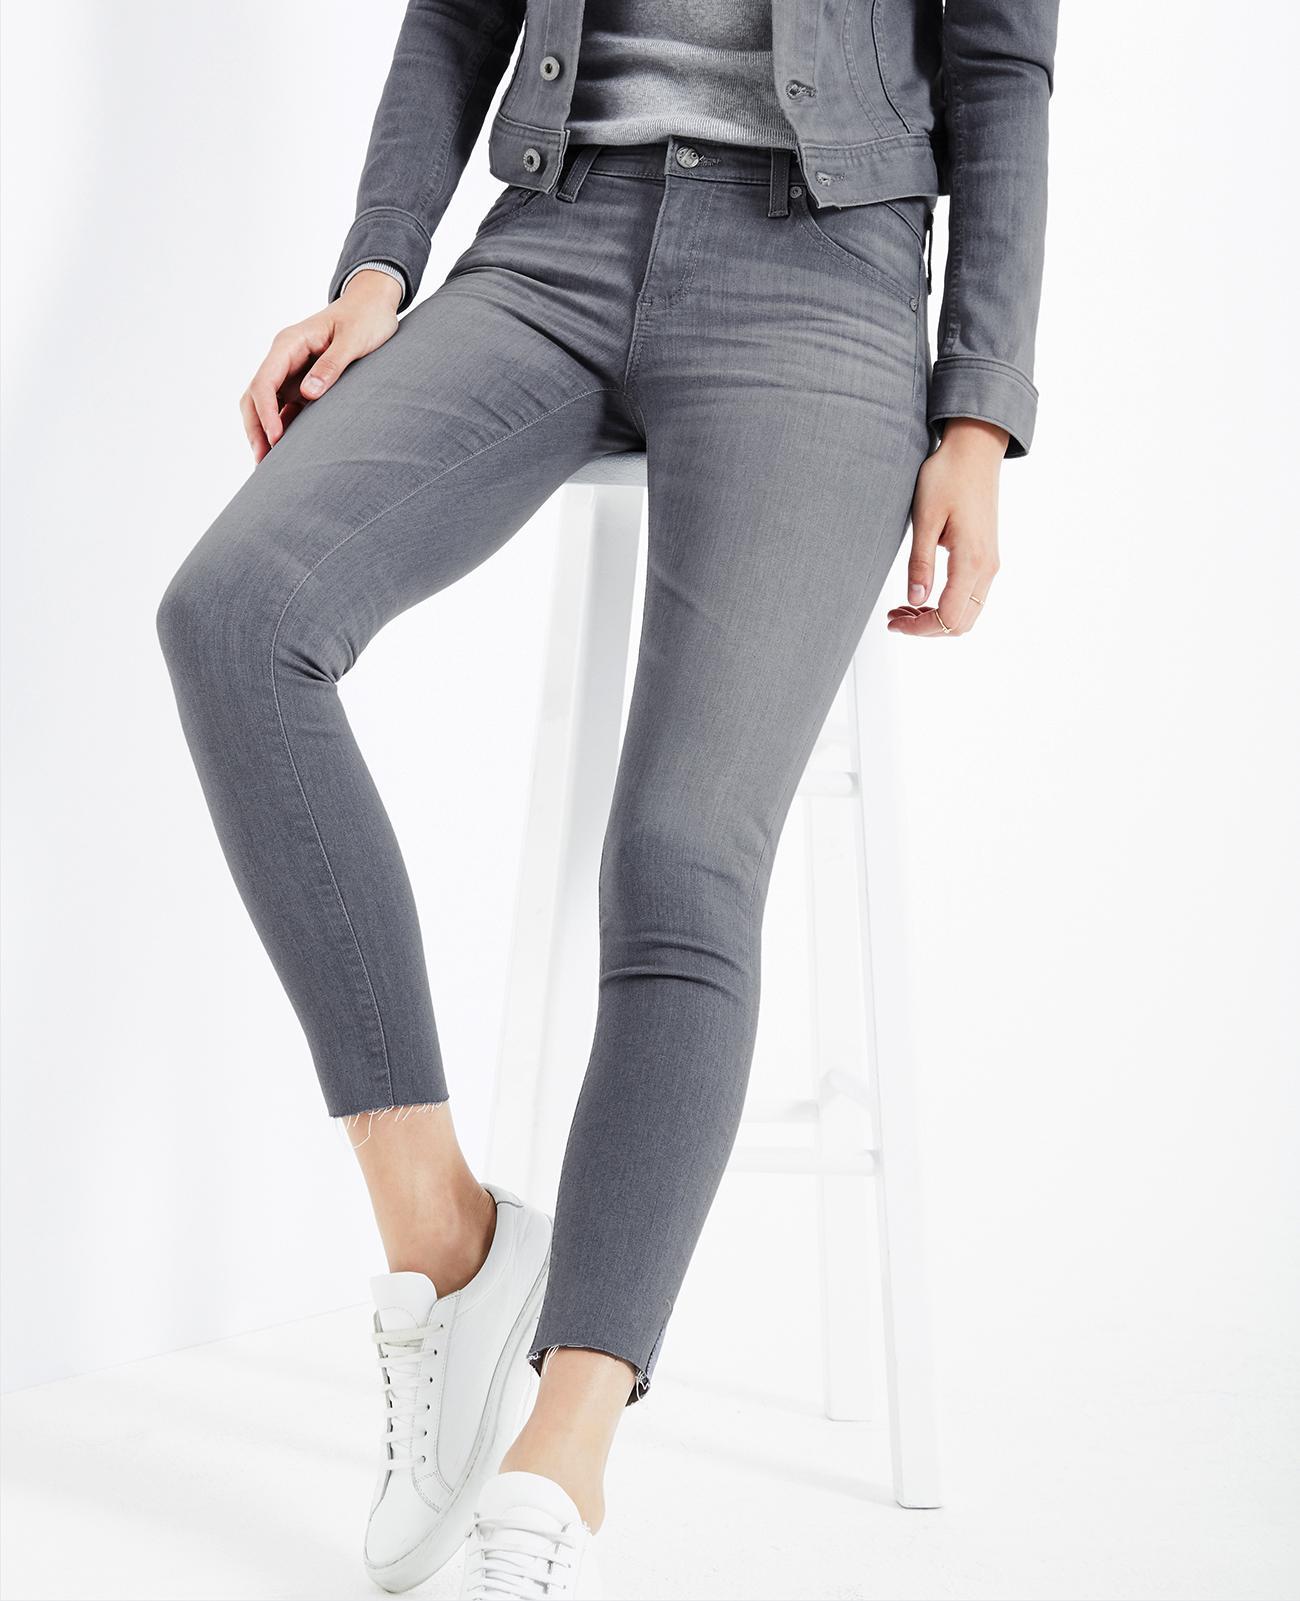 skinny jeans - Grey AG - Adriano Goldschmied CFQb0h